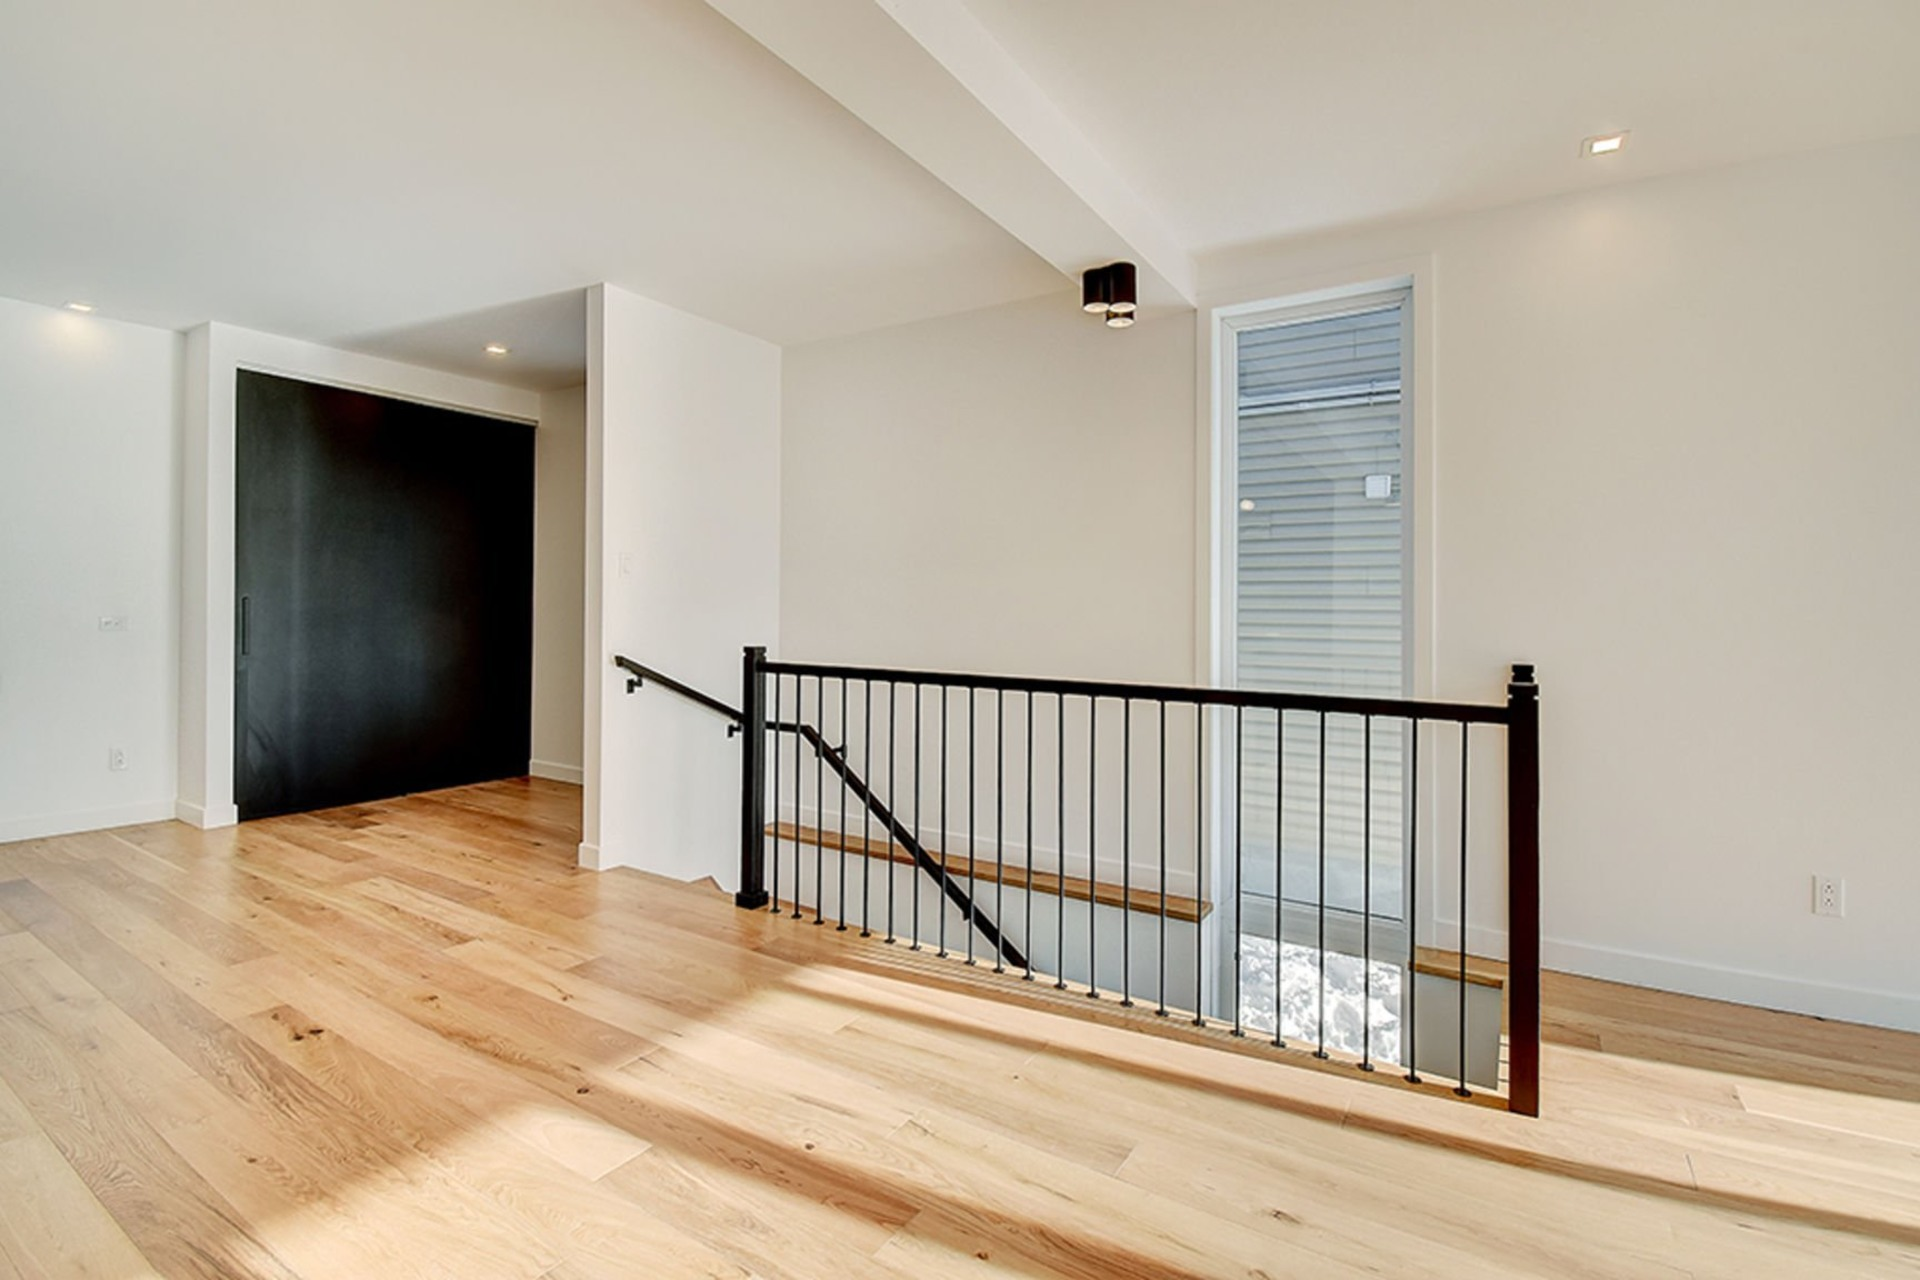 image 10 - Apartment For sale Le Vieux-Longueuil Longueuil  - 9 rooms